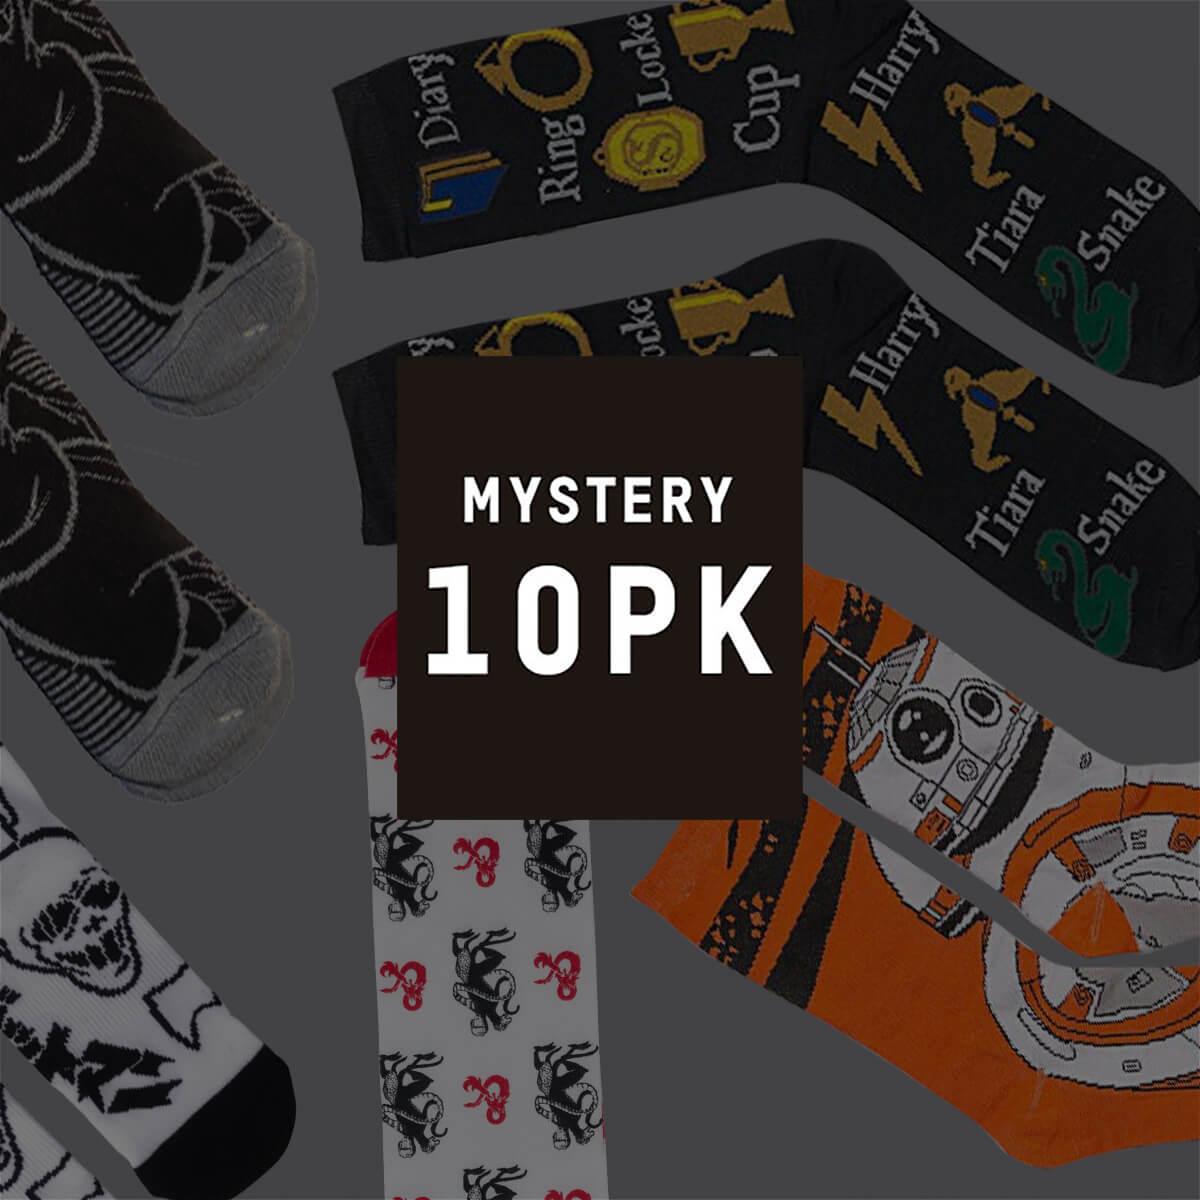 Pack 10 calcetines misteriosos